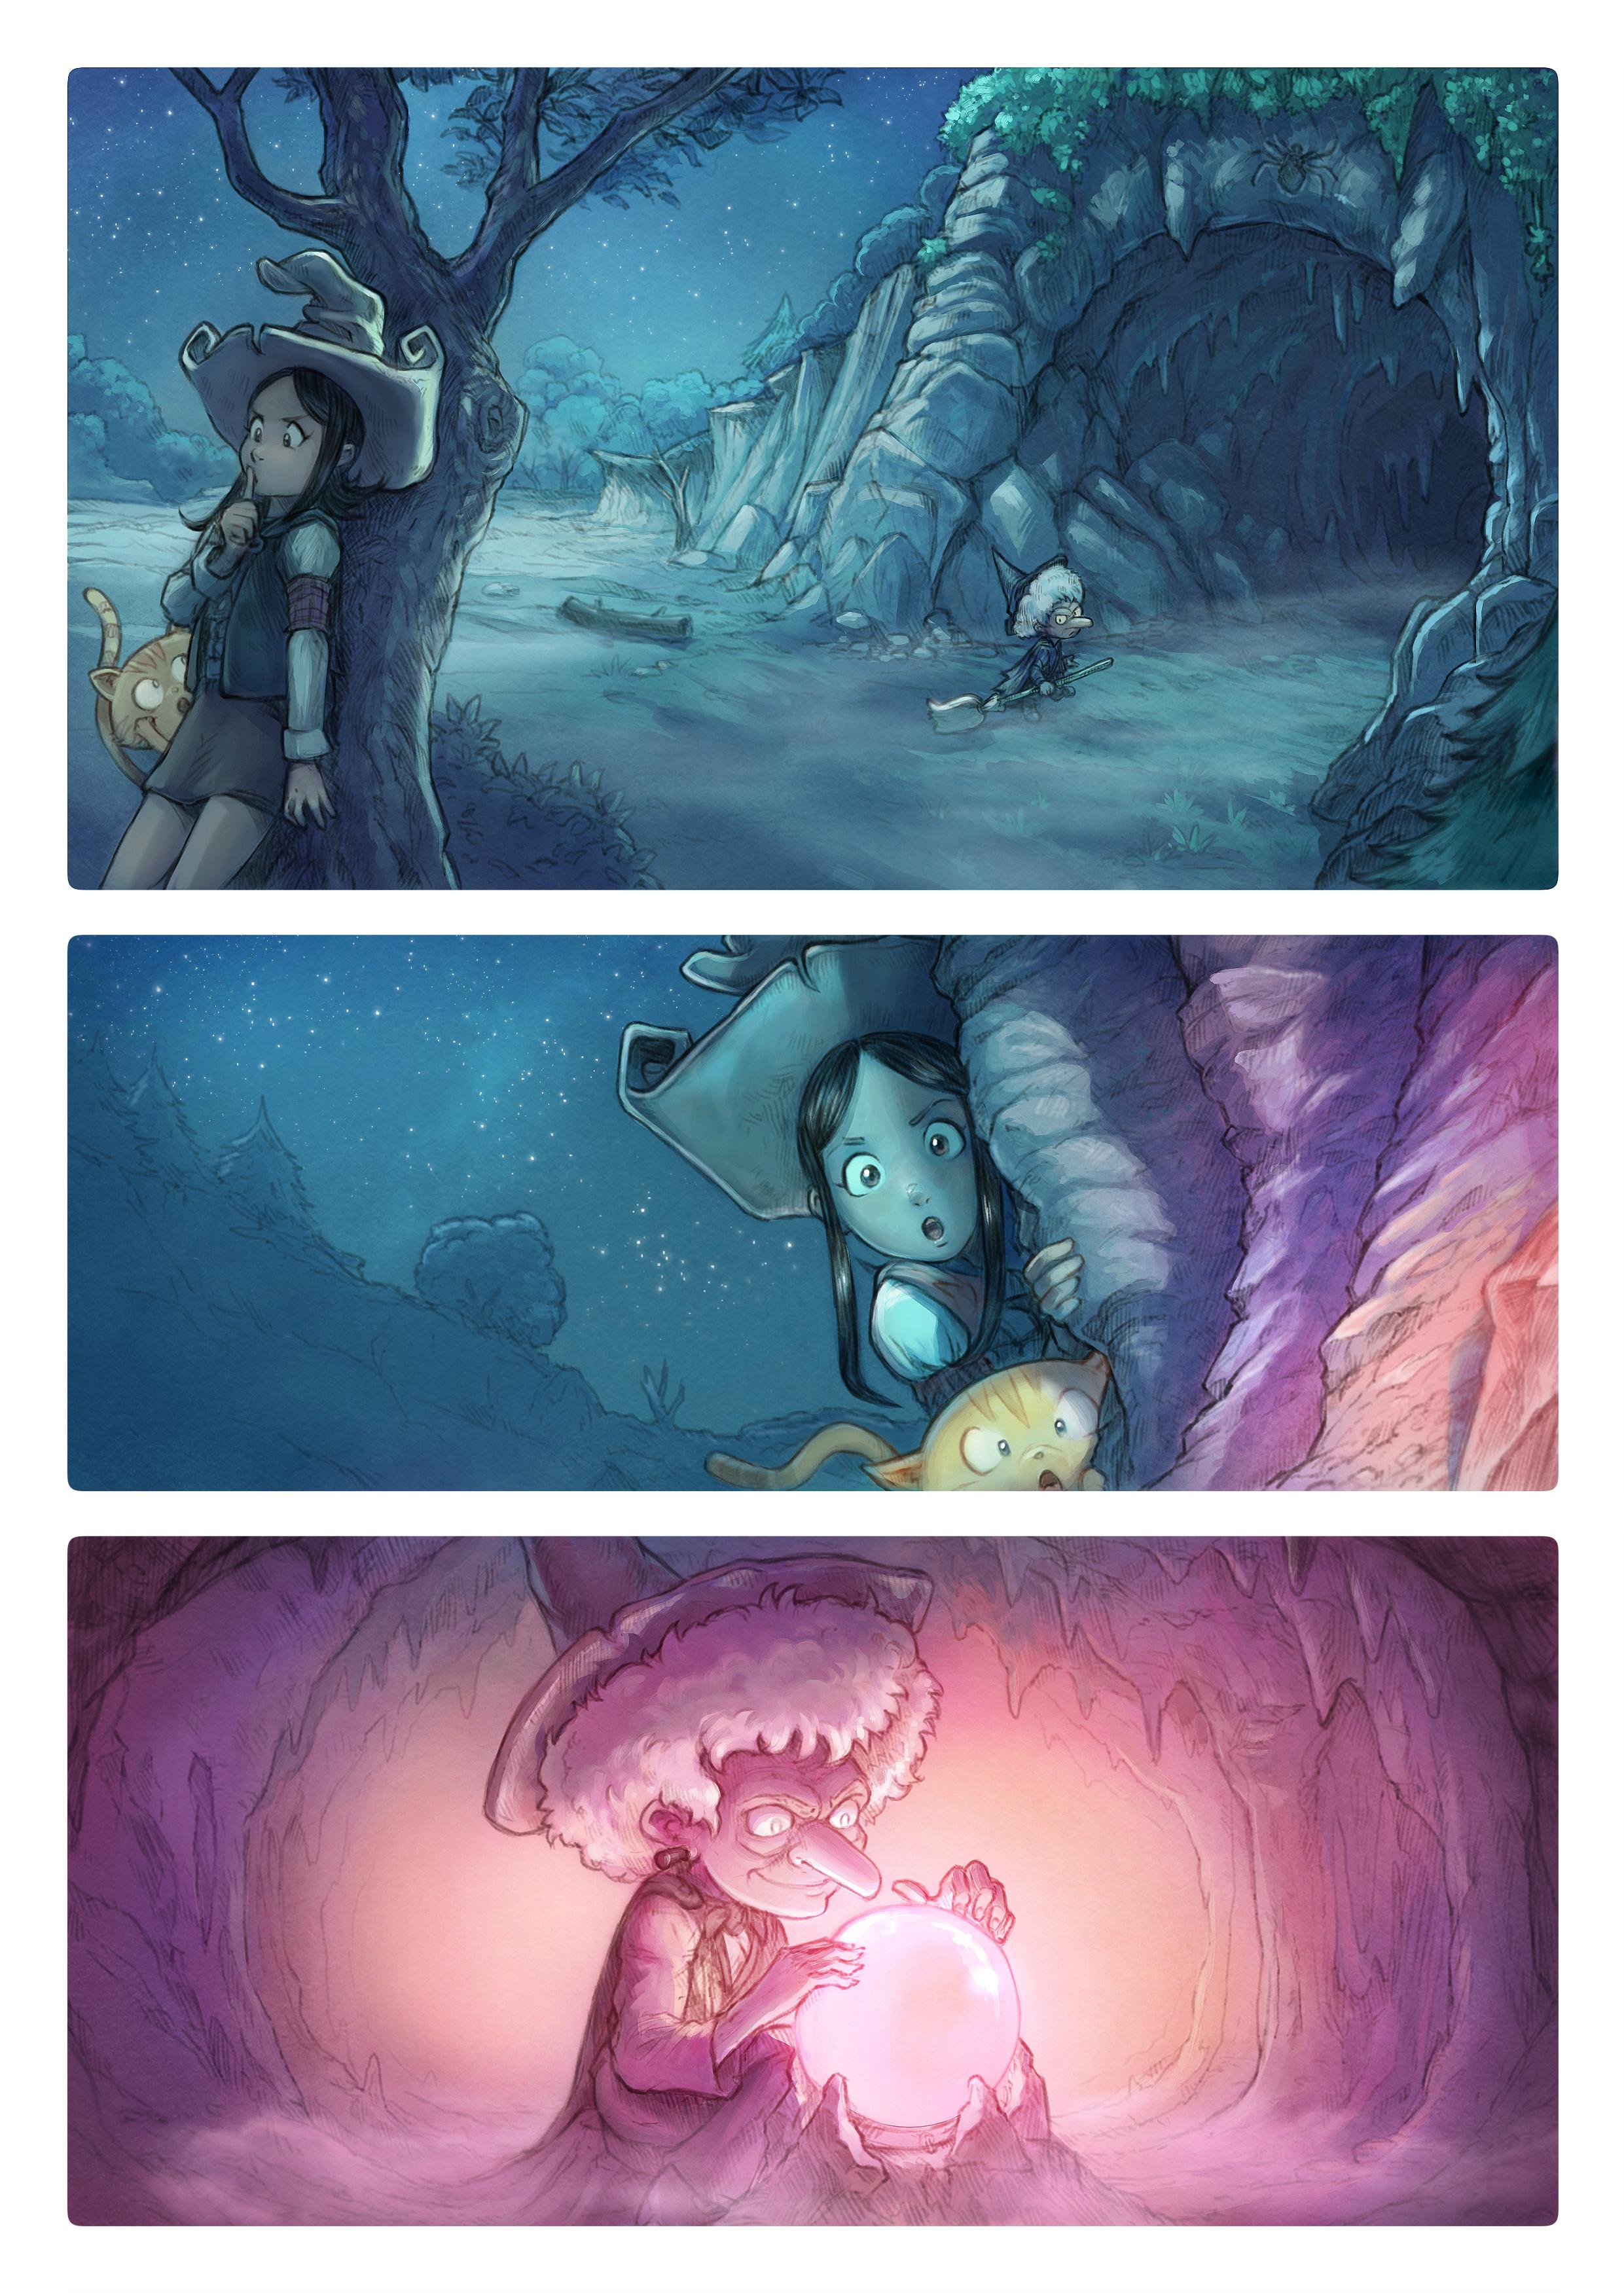 Episode 15: Krystallkulen, Page 1